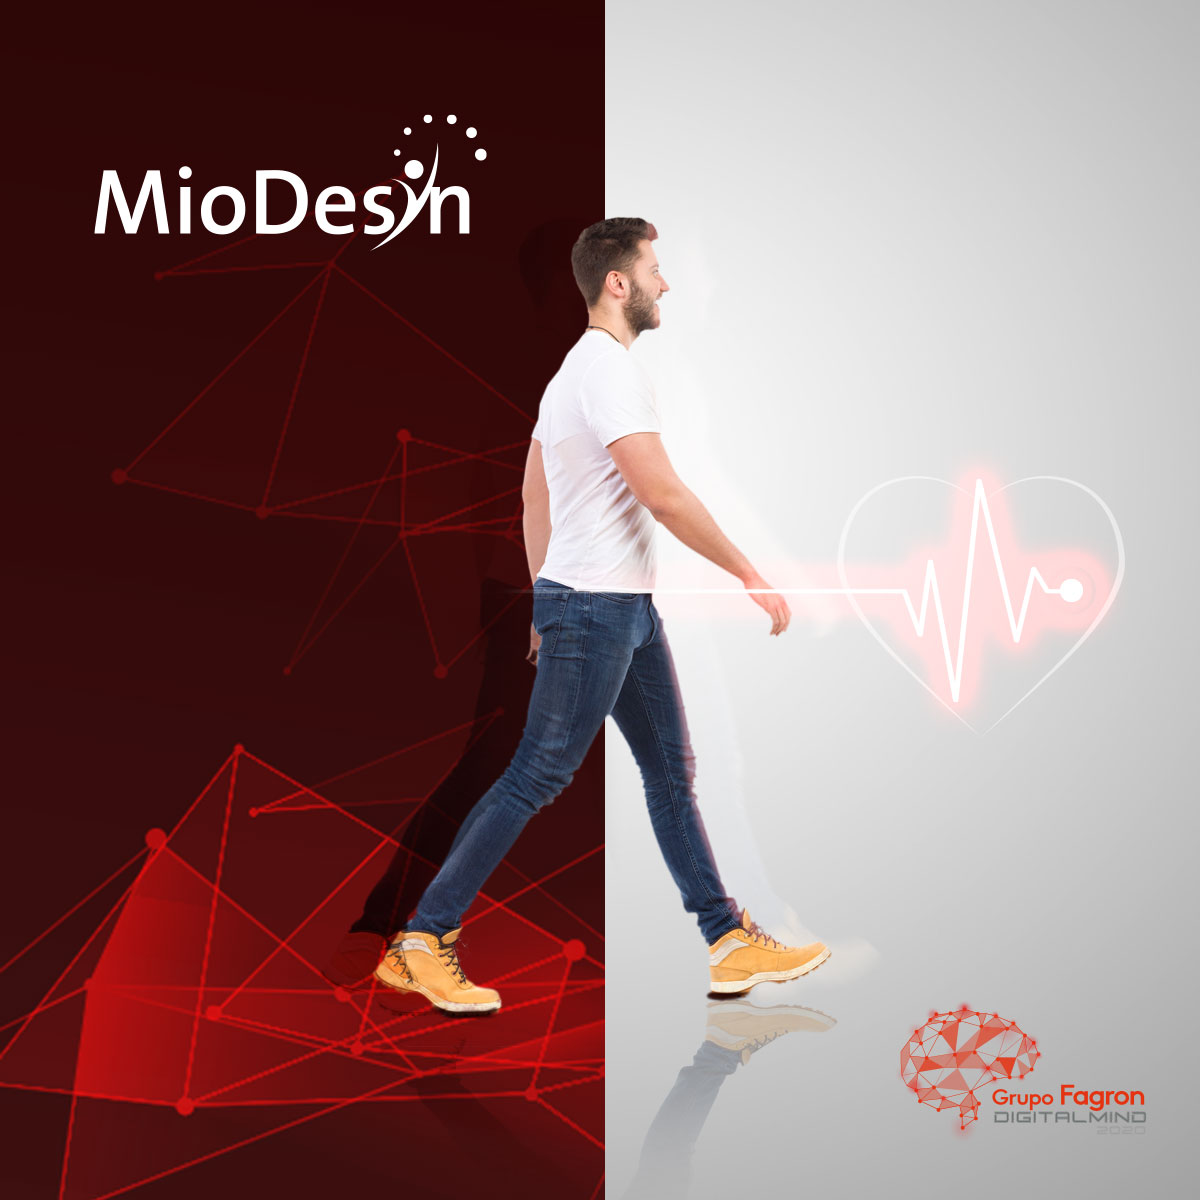 Miodesin Digital Mind 2020